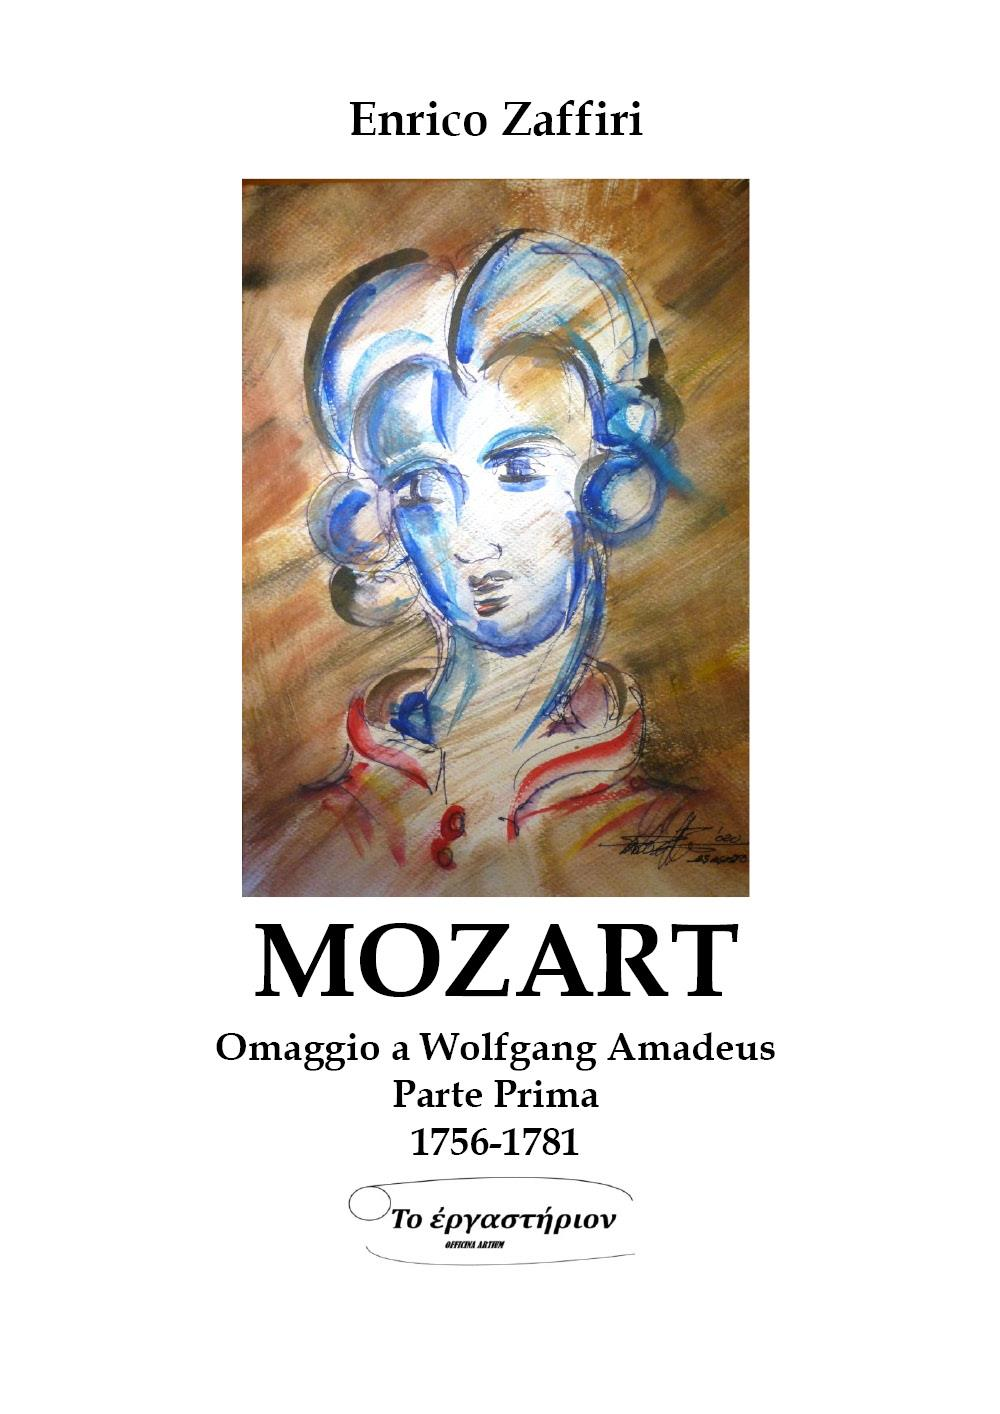 MOZART - Omaggio a Wolfgang Amadeus - Parte Prima - 1756-1781